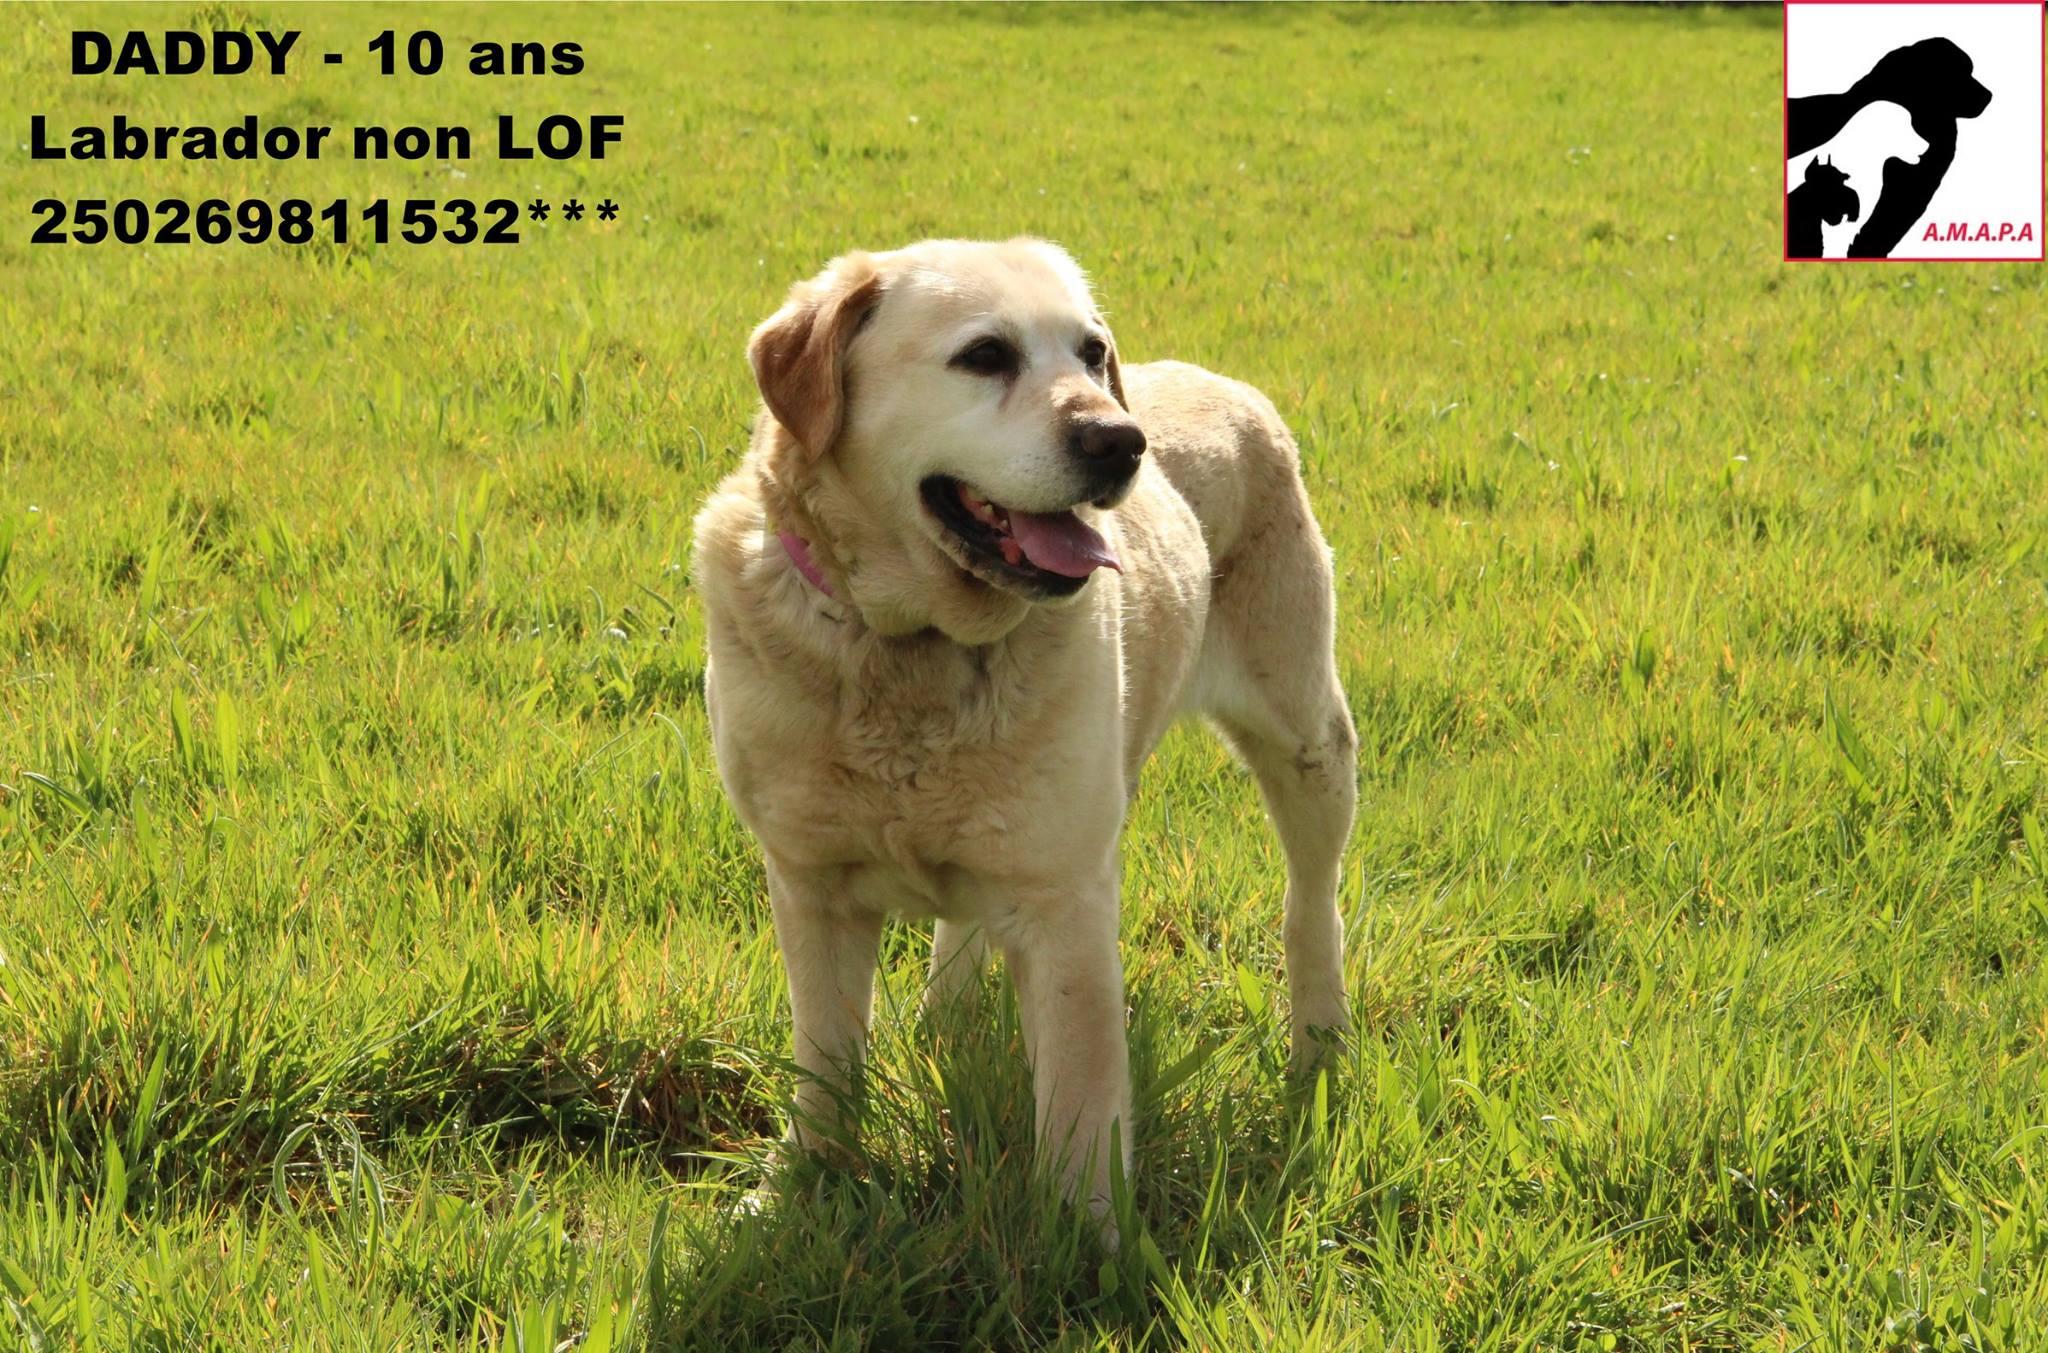 DADDY - labrador 10 ans - AMAPA à Coutances (50) 5b4db7eab76f5693200113